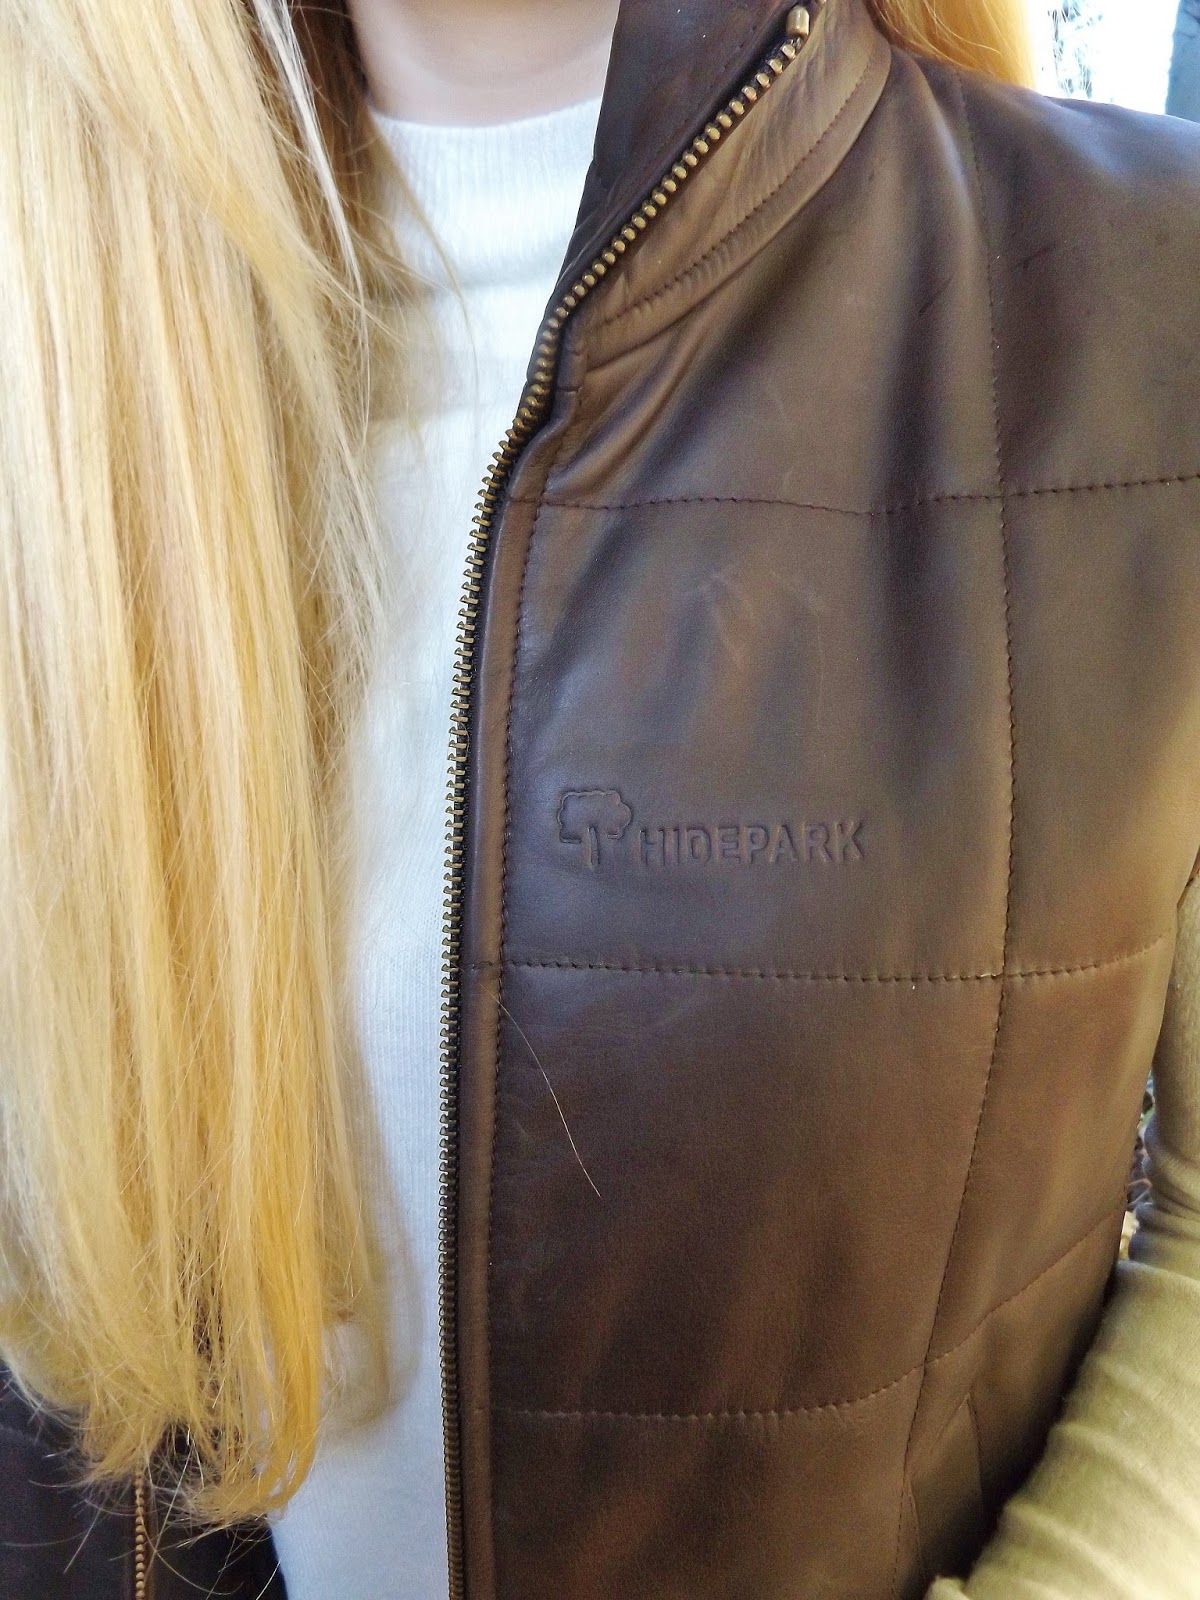 Hidepark Leather Gilet